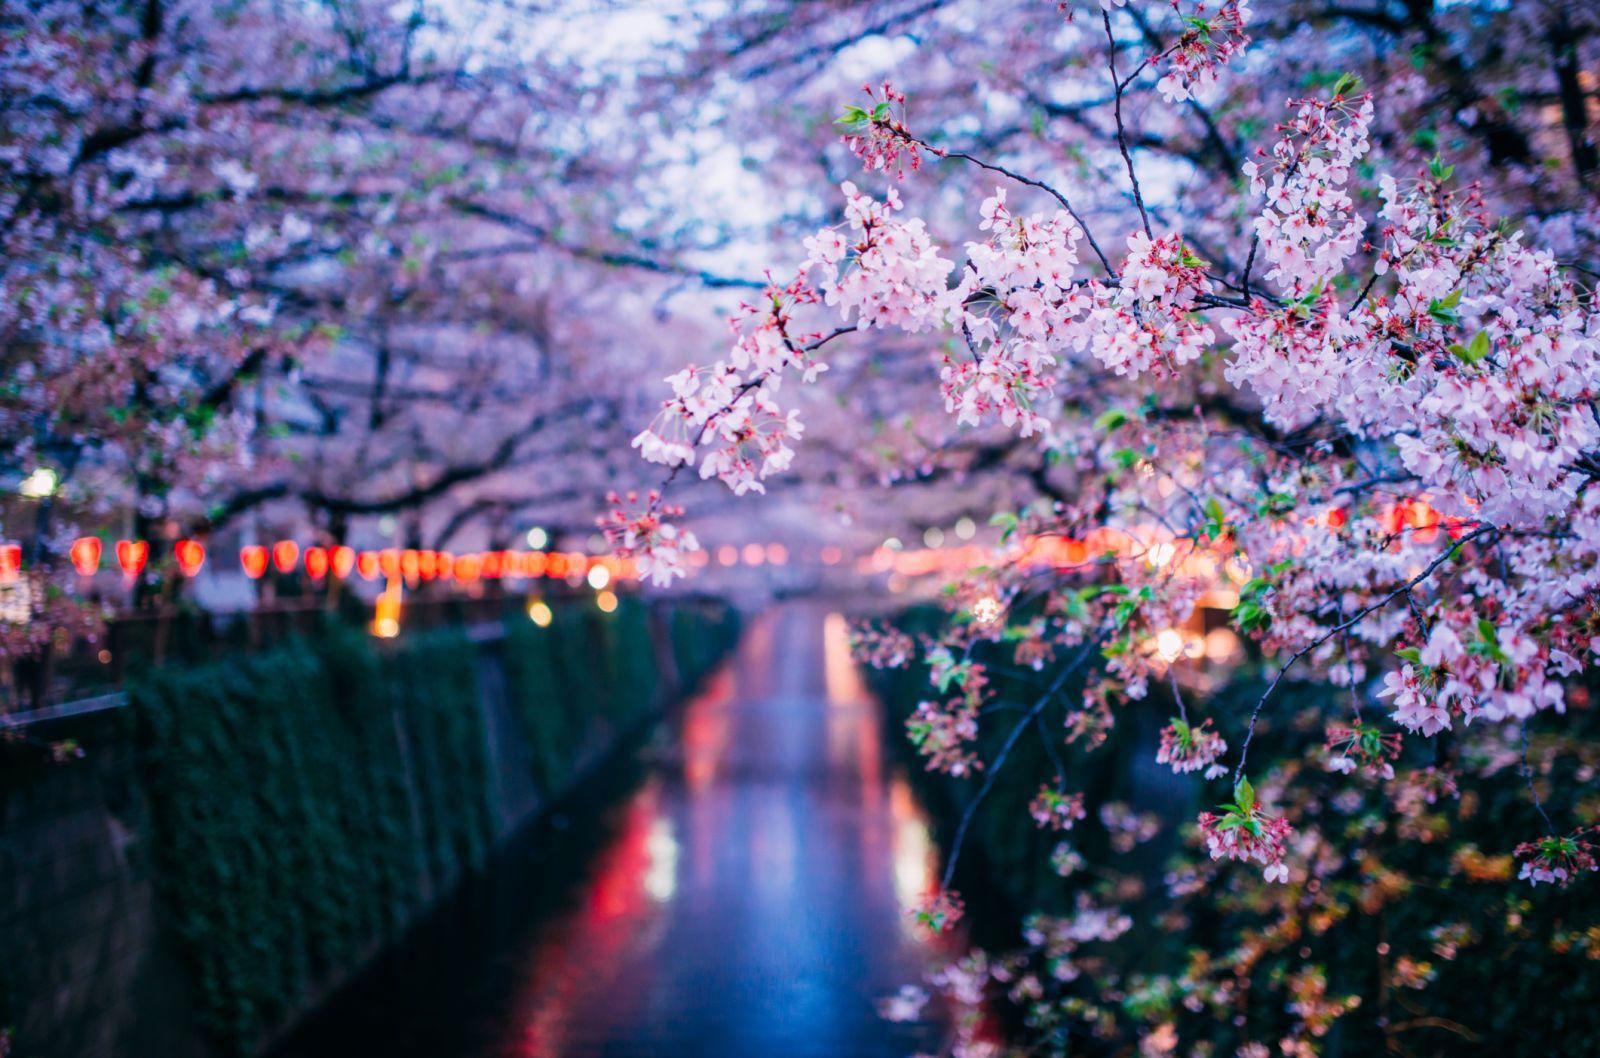 Pin By Natalia Carrillo On Flowers Sakura Cherry Blossom Sakura Flower Cherry Blossom Tree